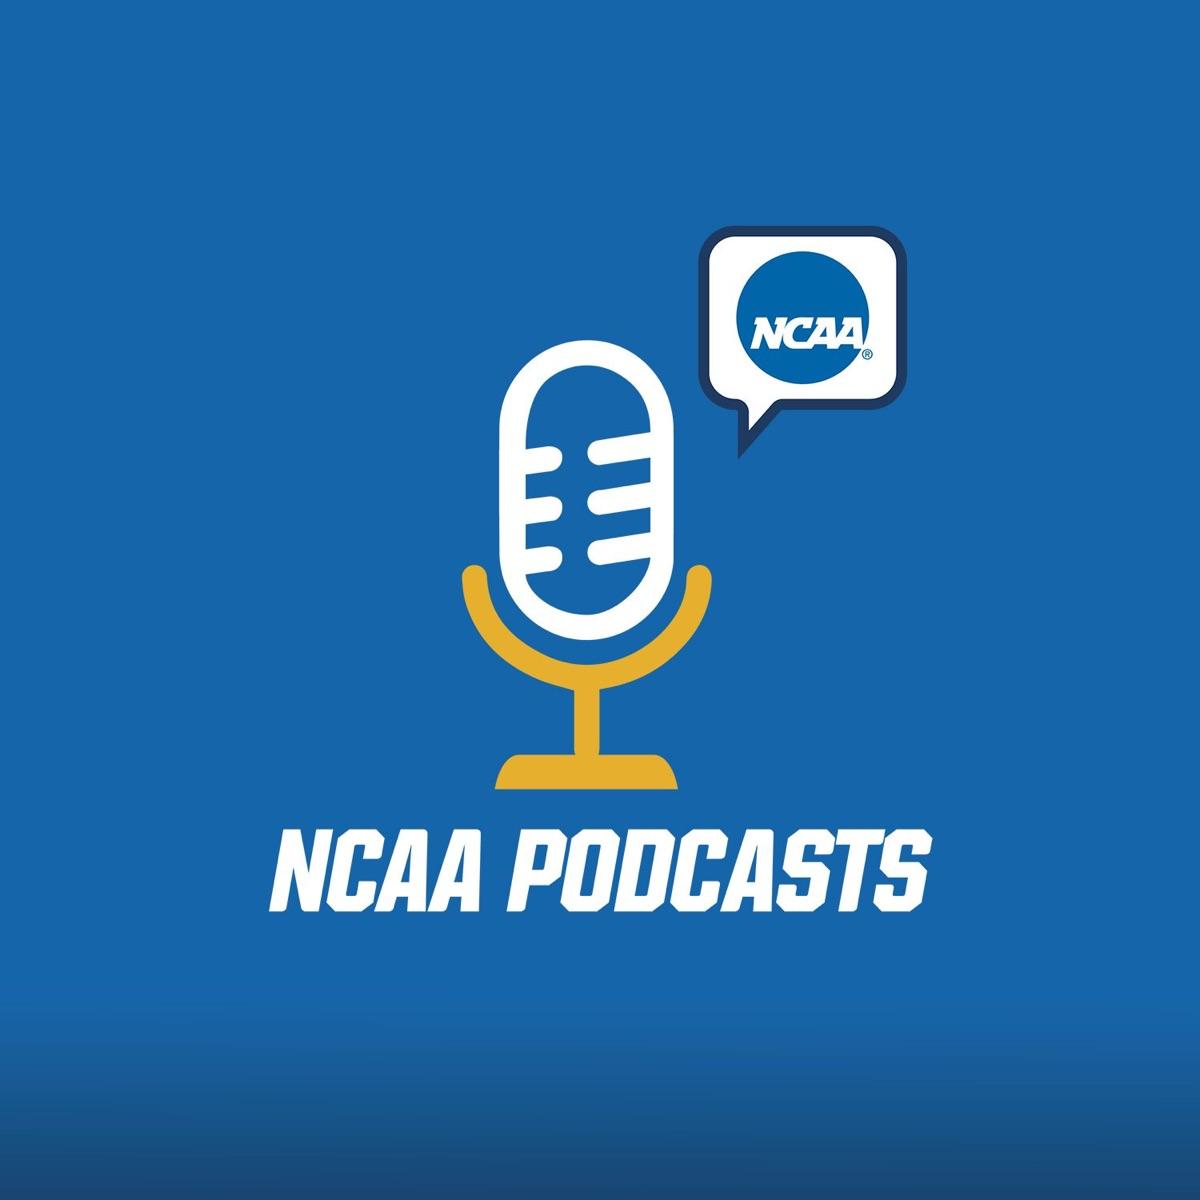 NCAA Podcasts